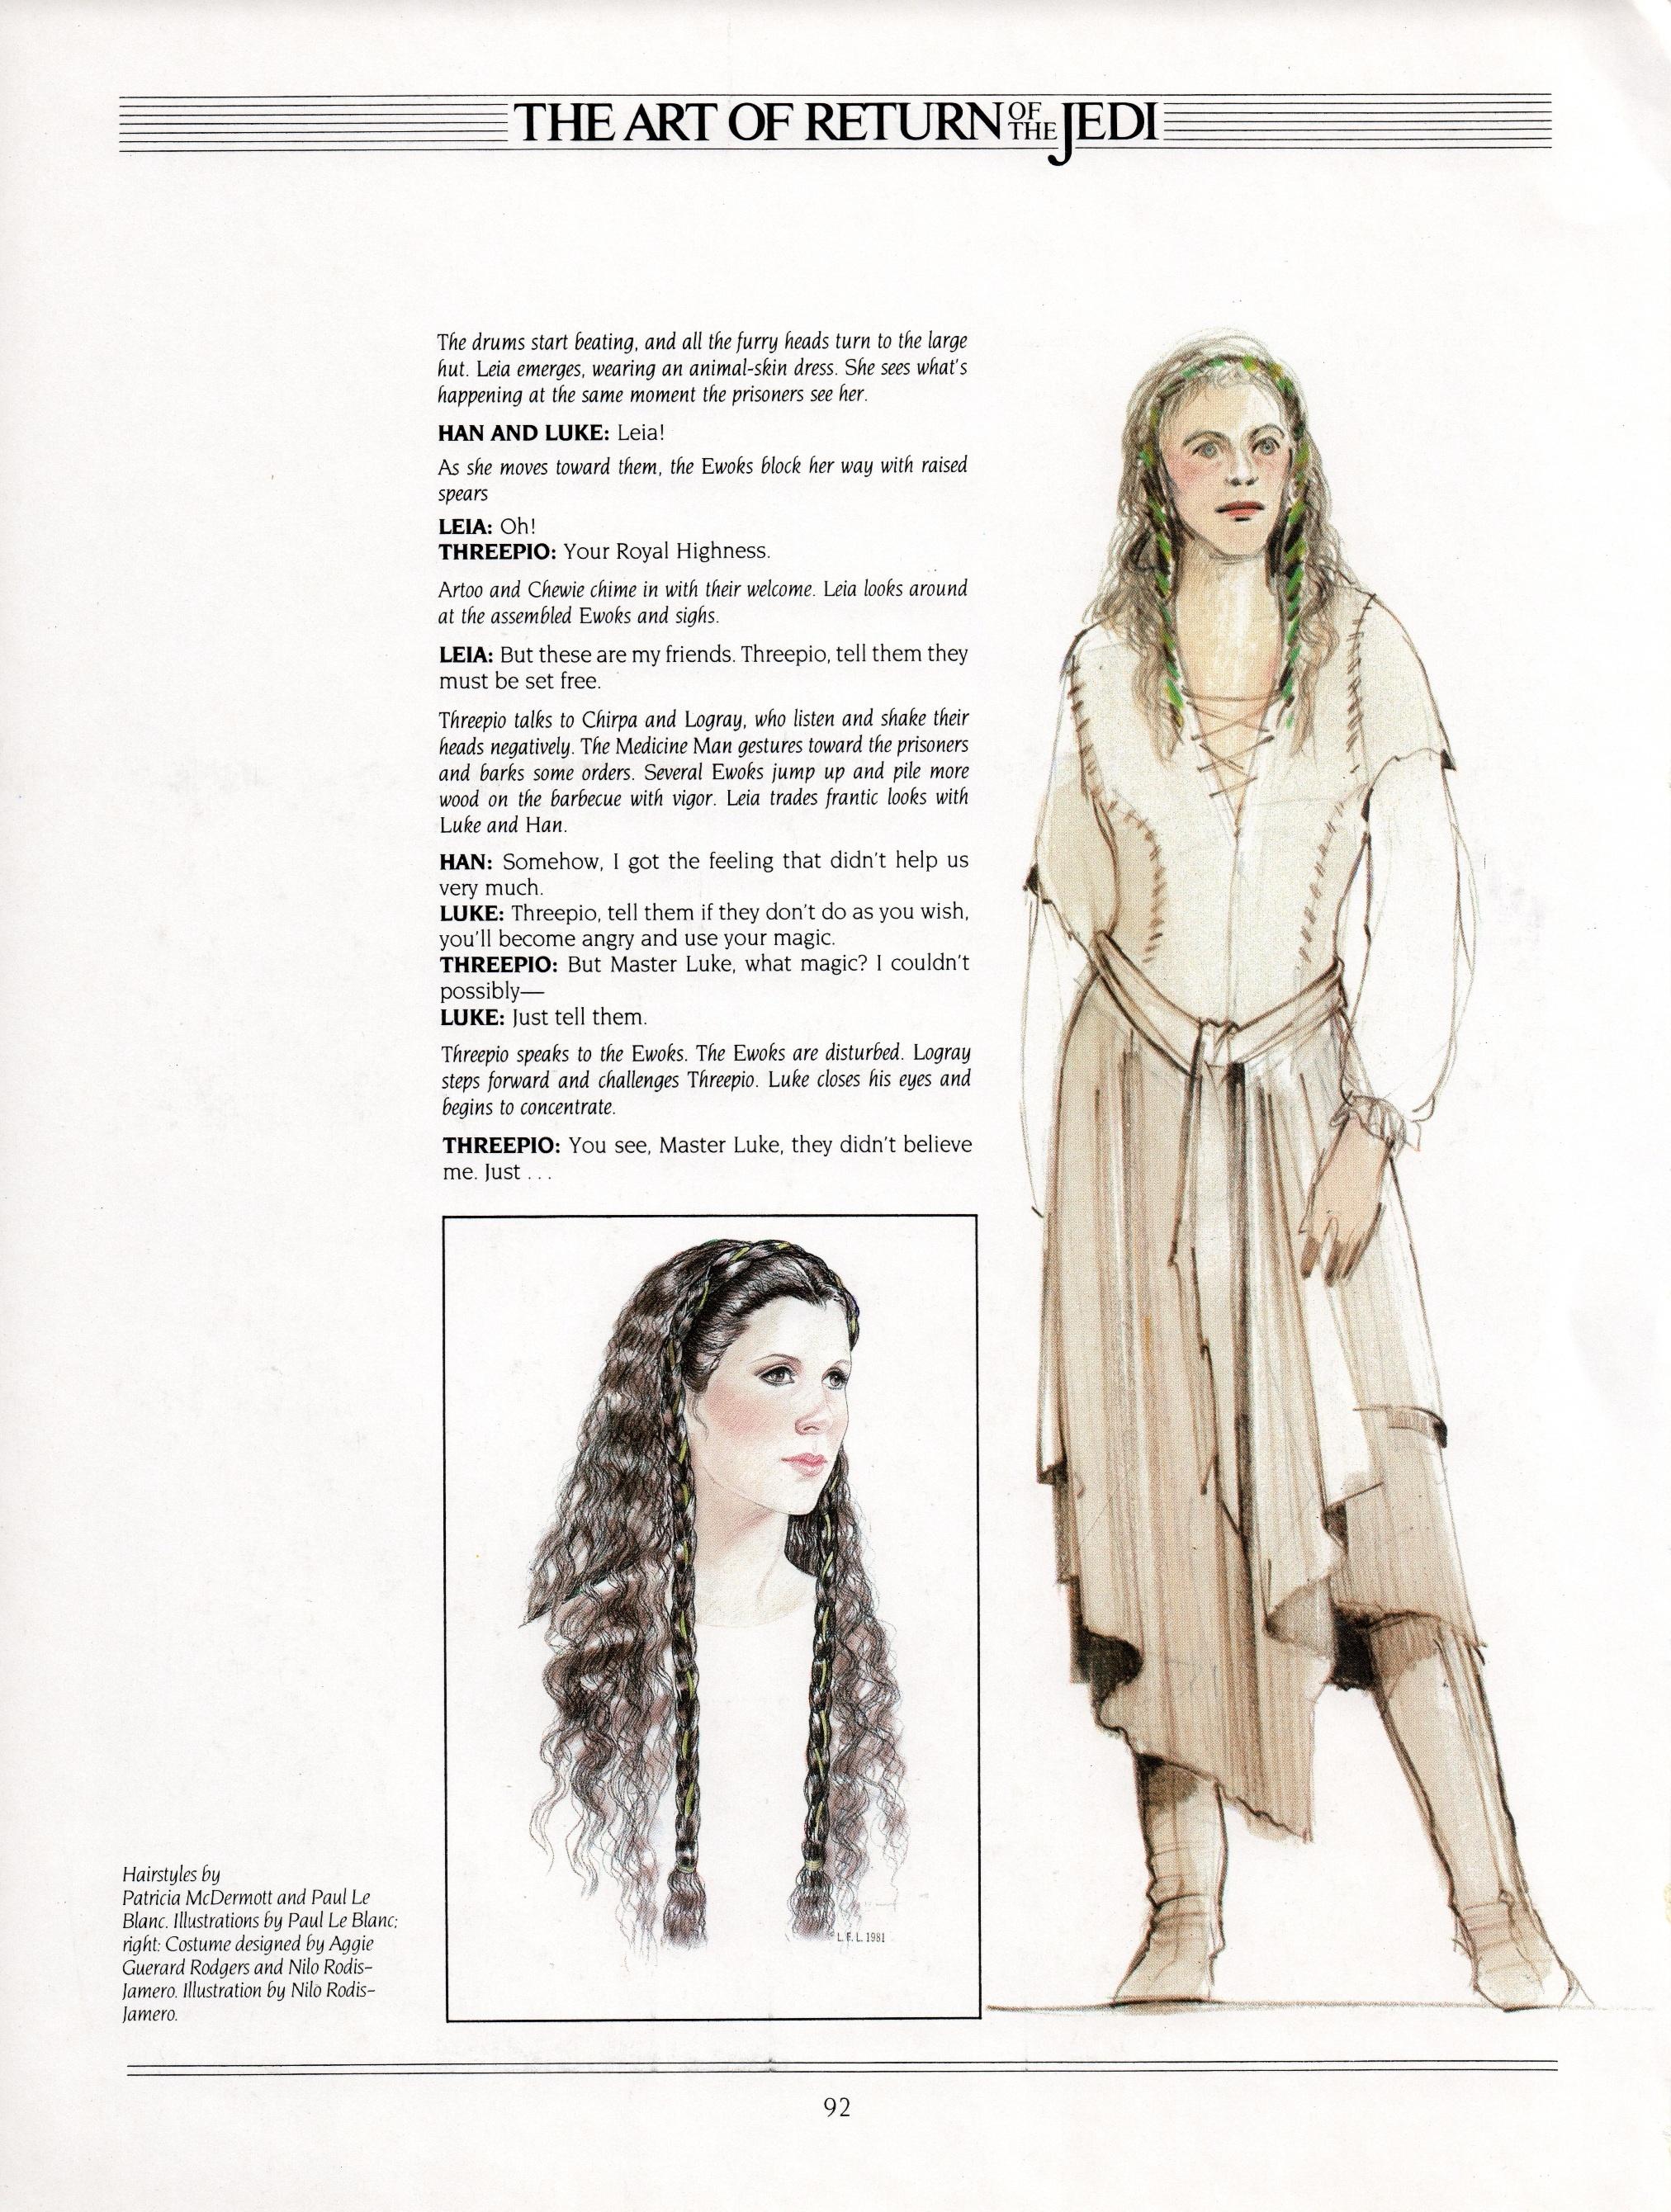 Art of Return of the Jedi (b0bafett_Empire)-p092